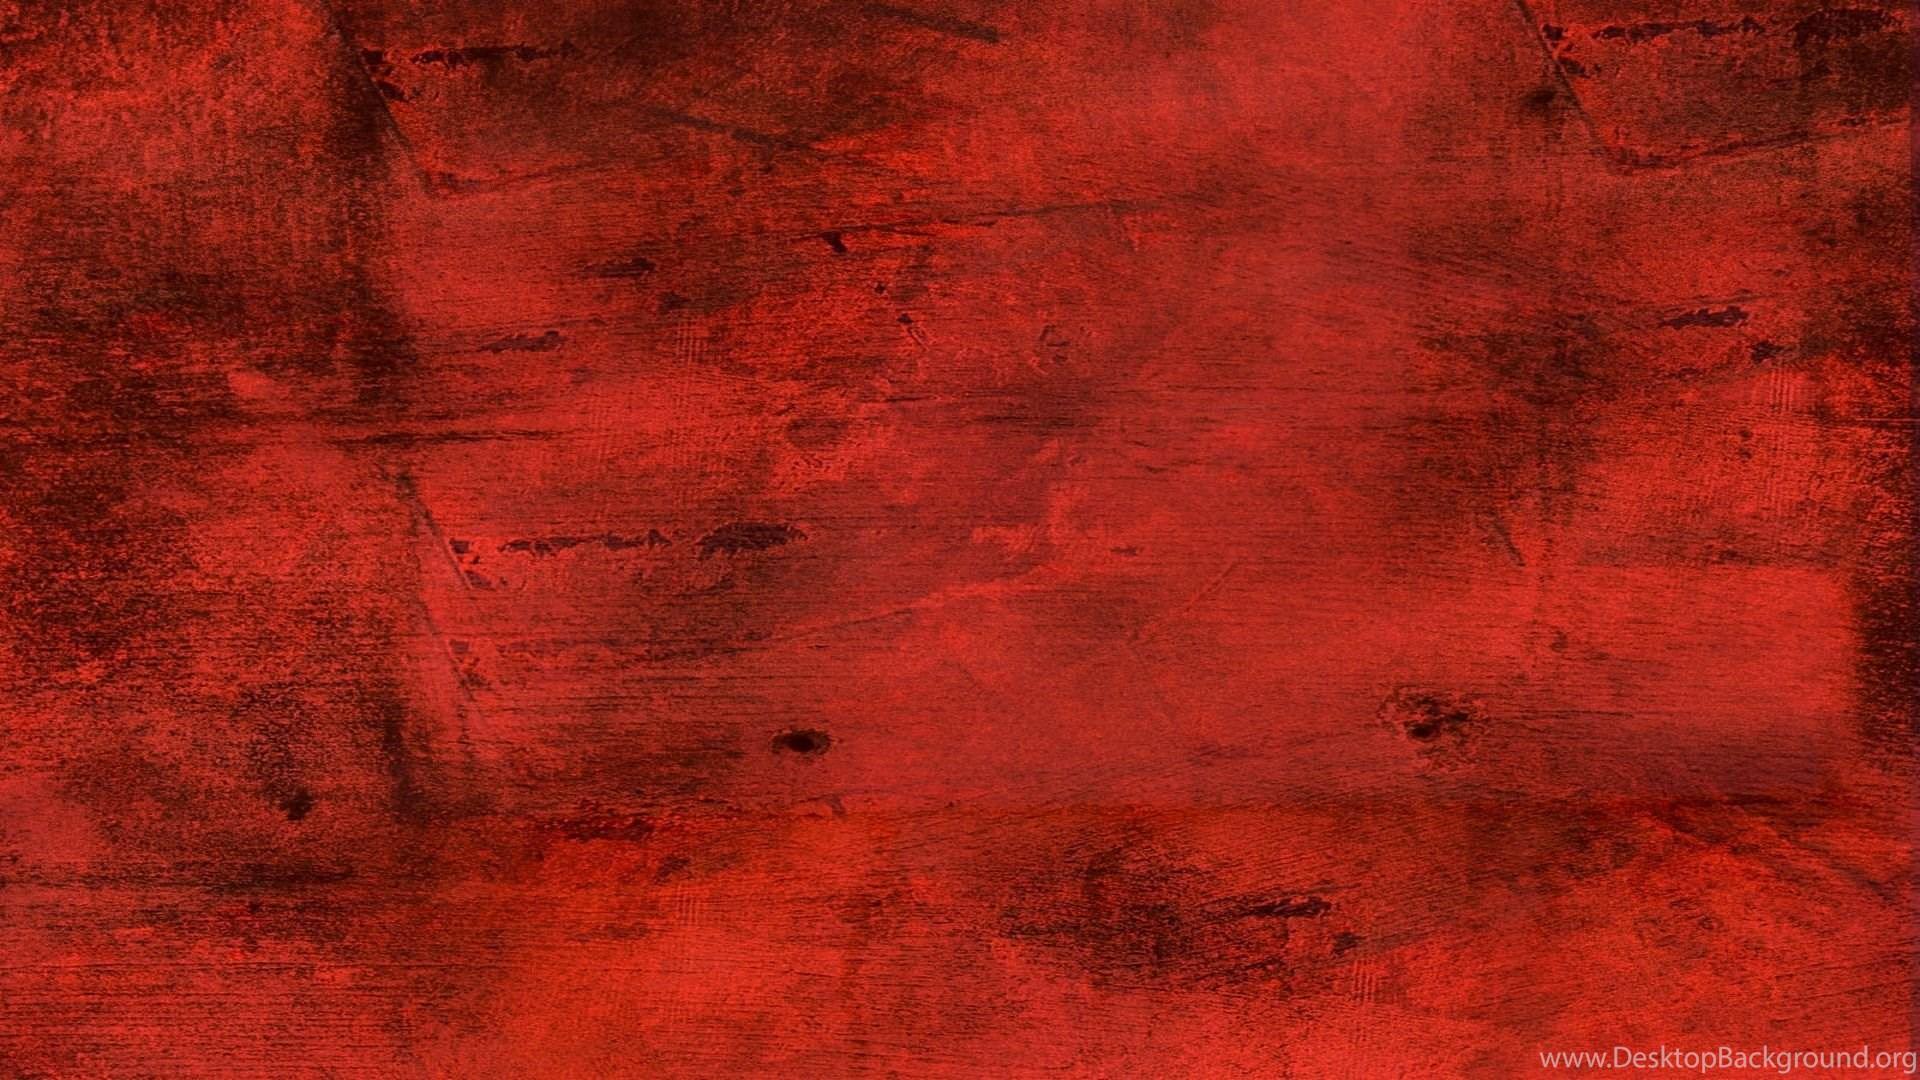 Textured Background Images EZTechTraining.com Desktop Background